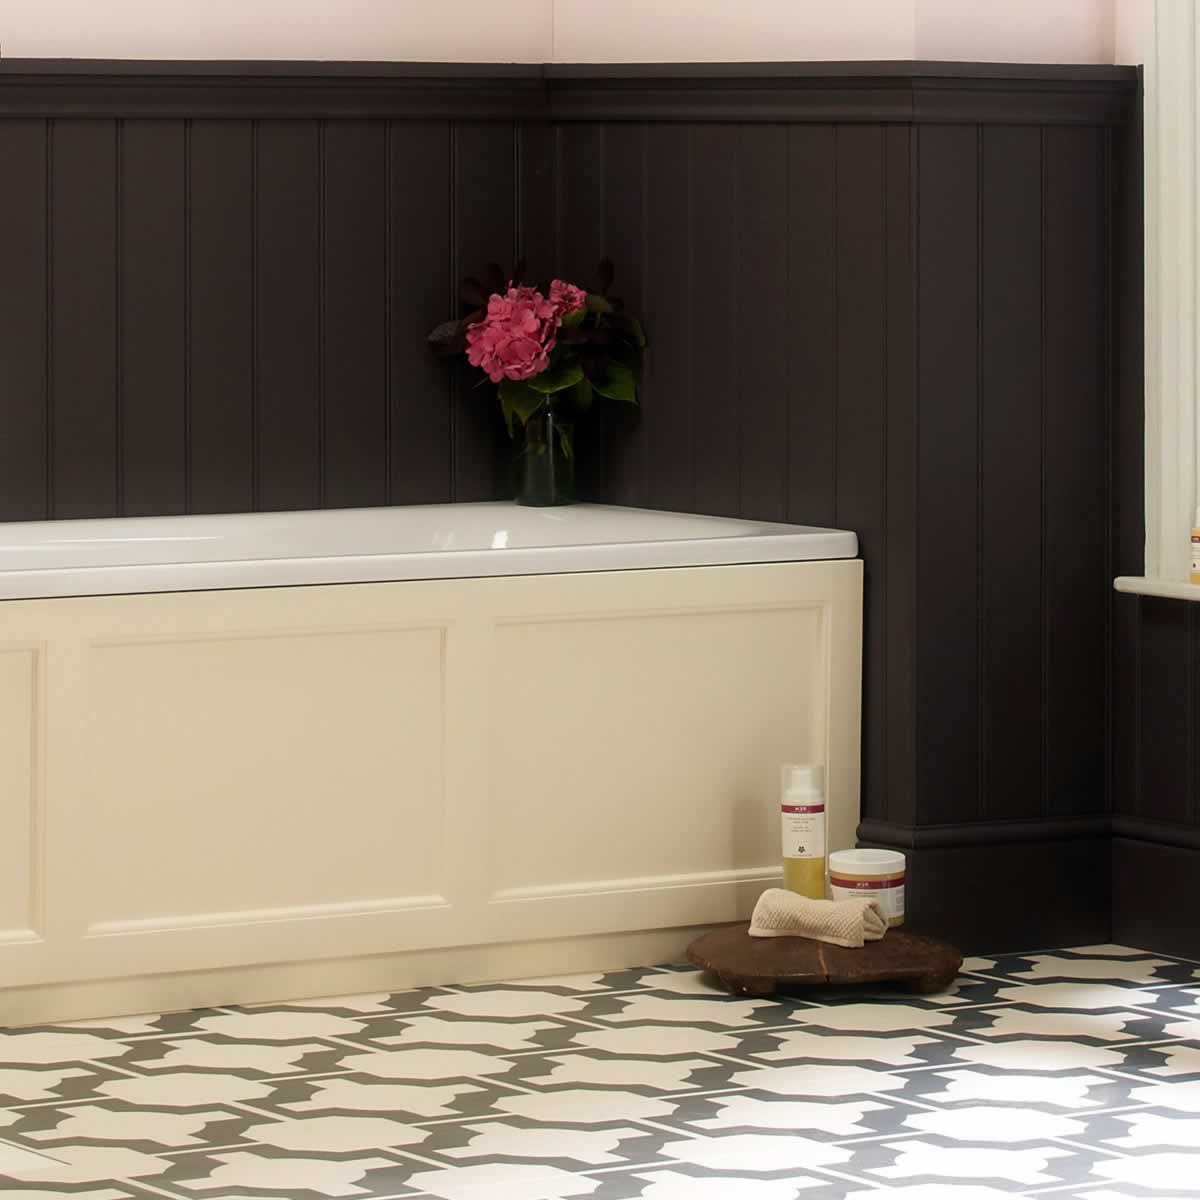 roper rhodes hampton bath panels uk bathrooms. Black Bedroom Furniture Sets. Home Design Ideas